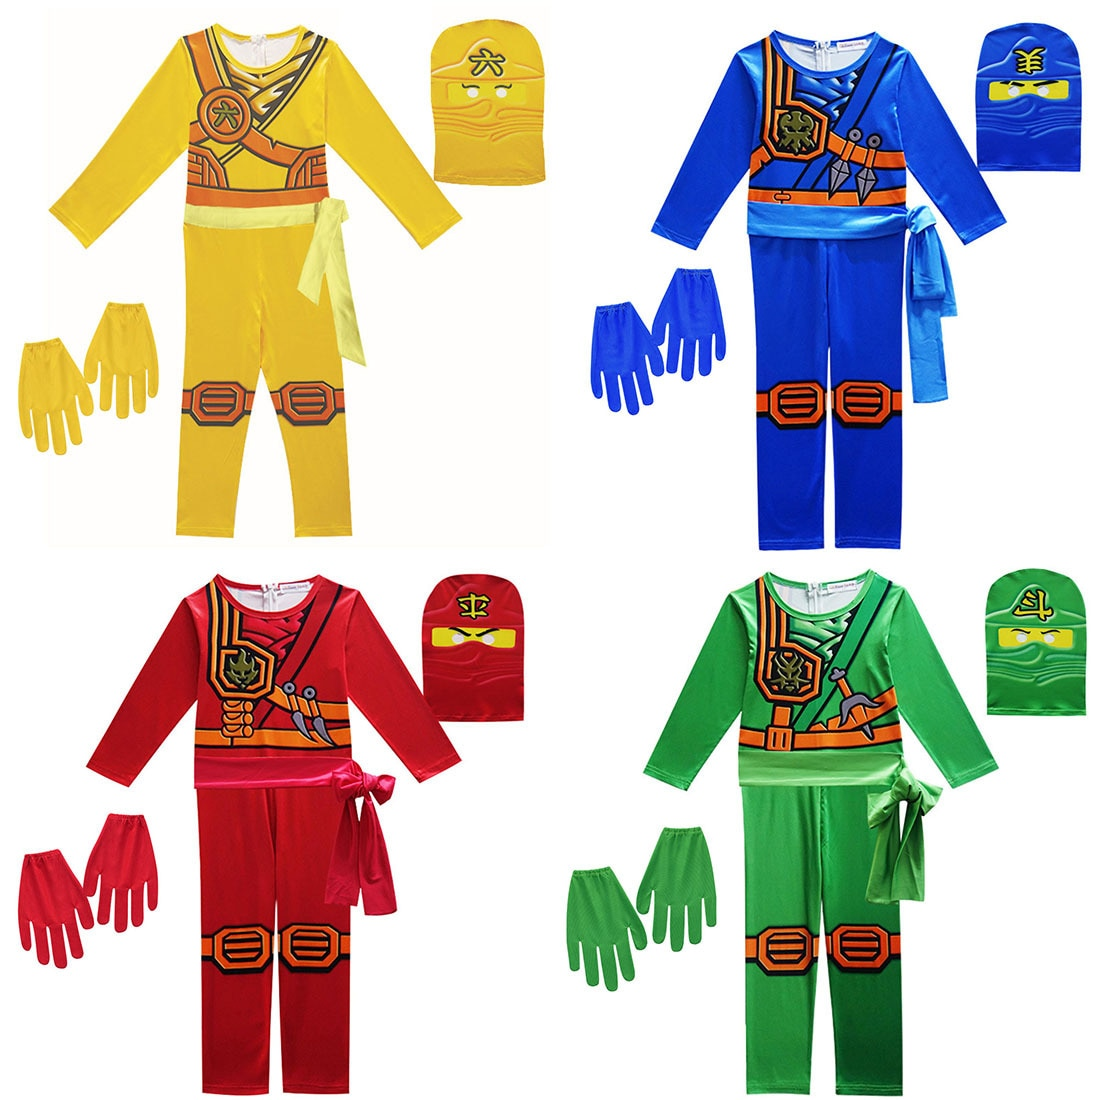 2020 NINJAGO Role cosplay Costume Halloween Boys Girls Jumpsuit Set Ninja Halloween Christmas funny Party clothing for boy